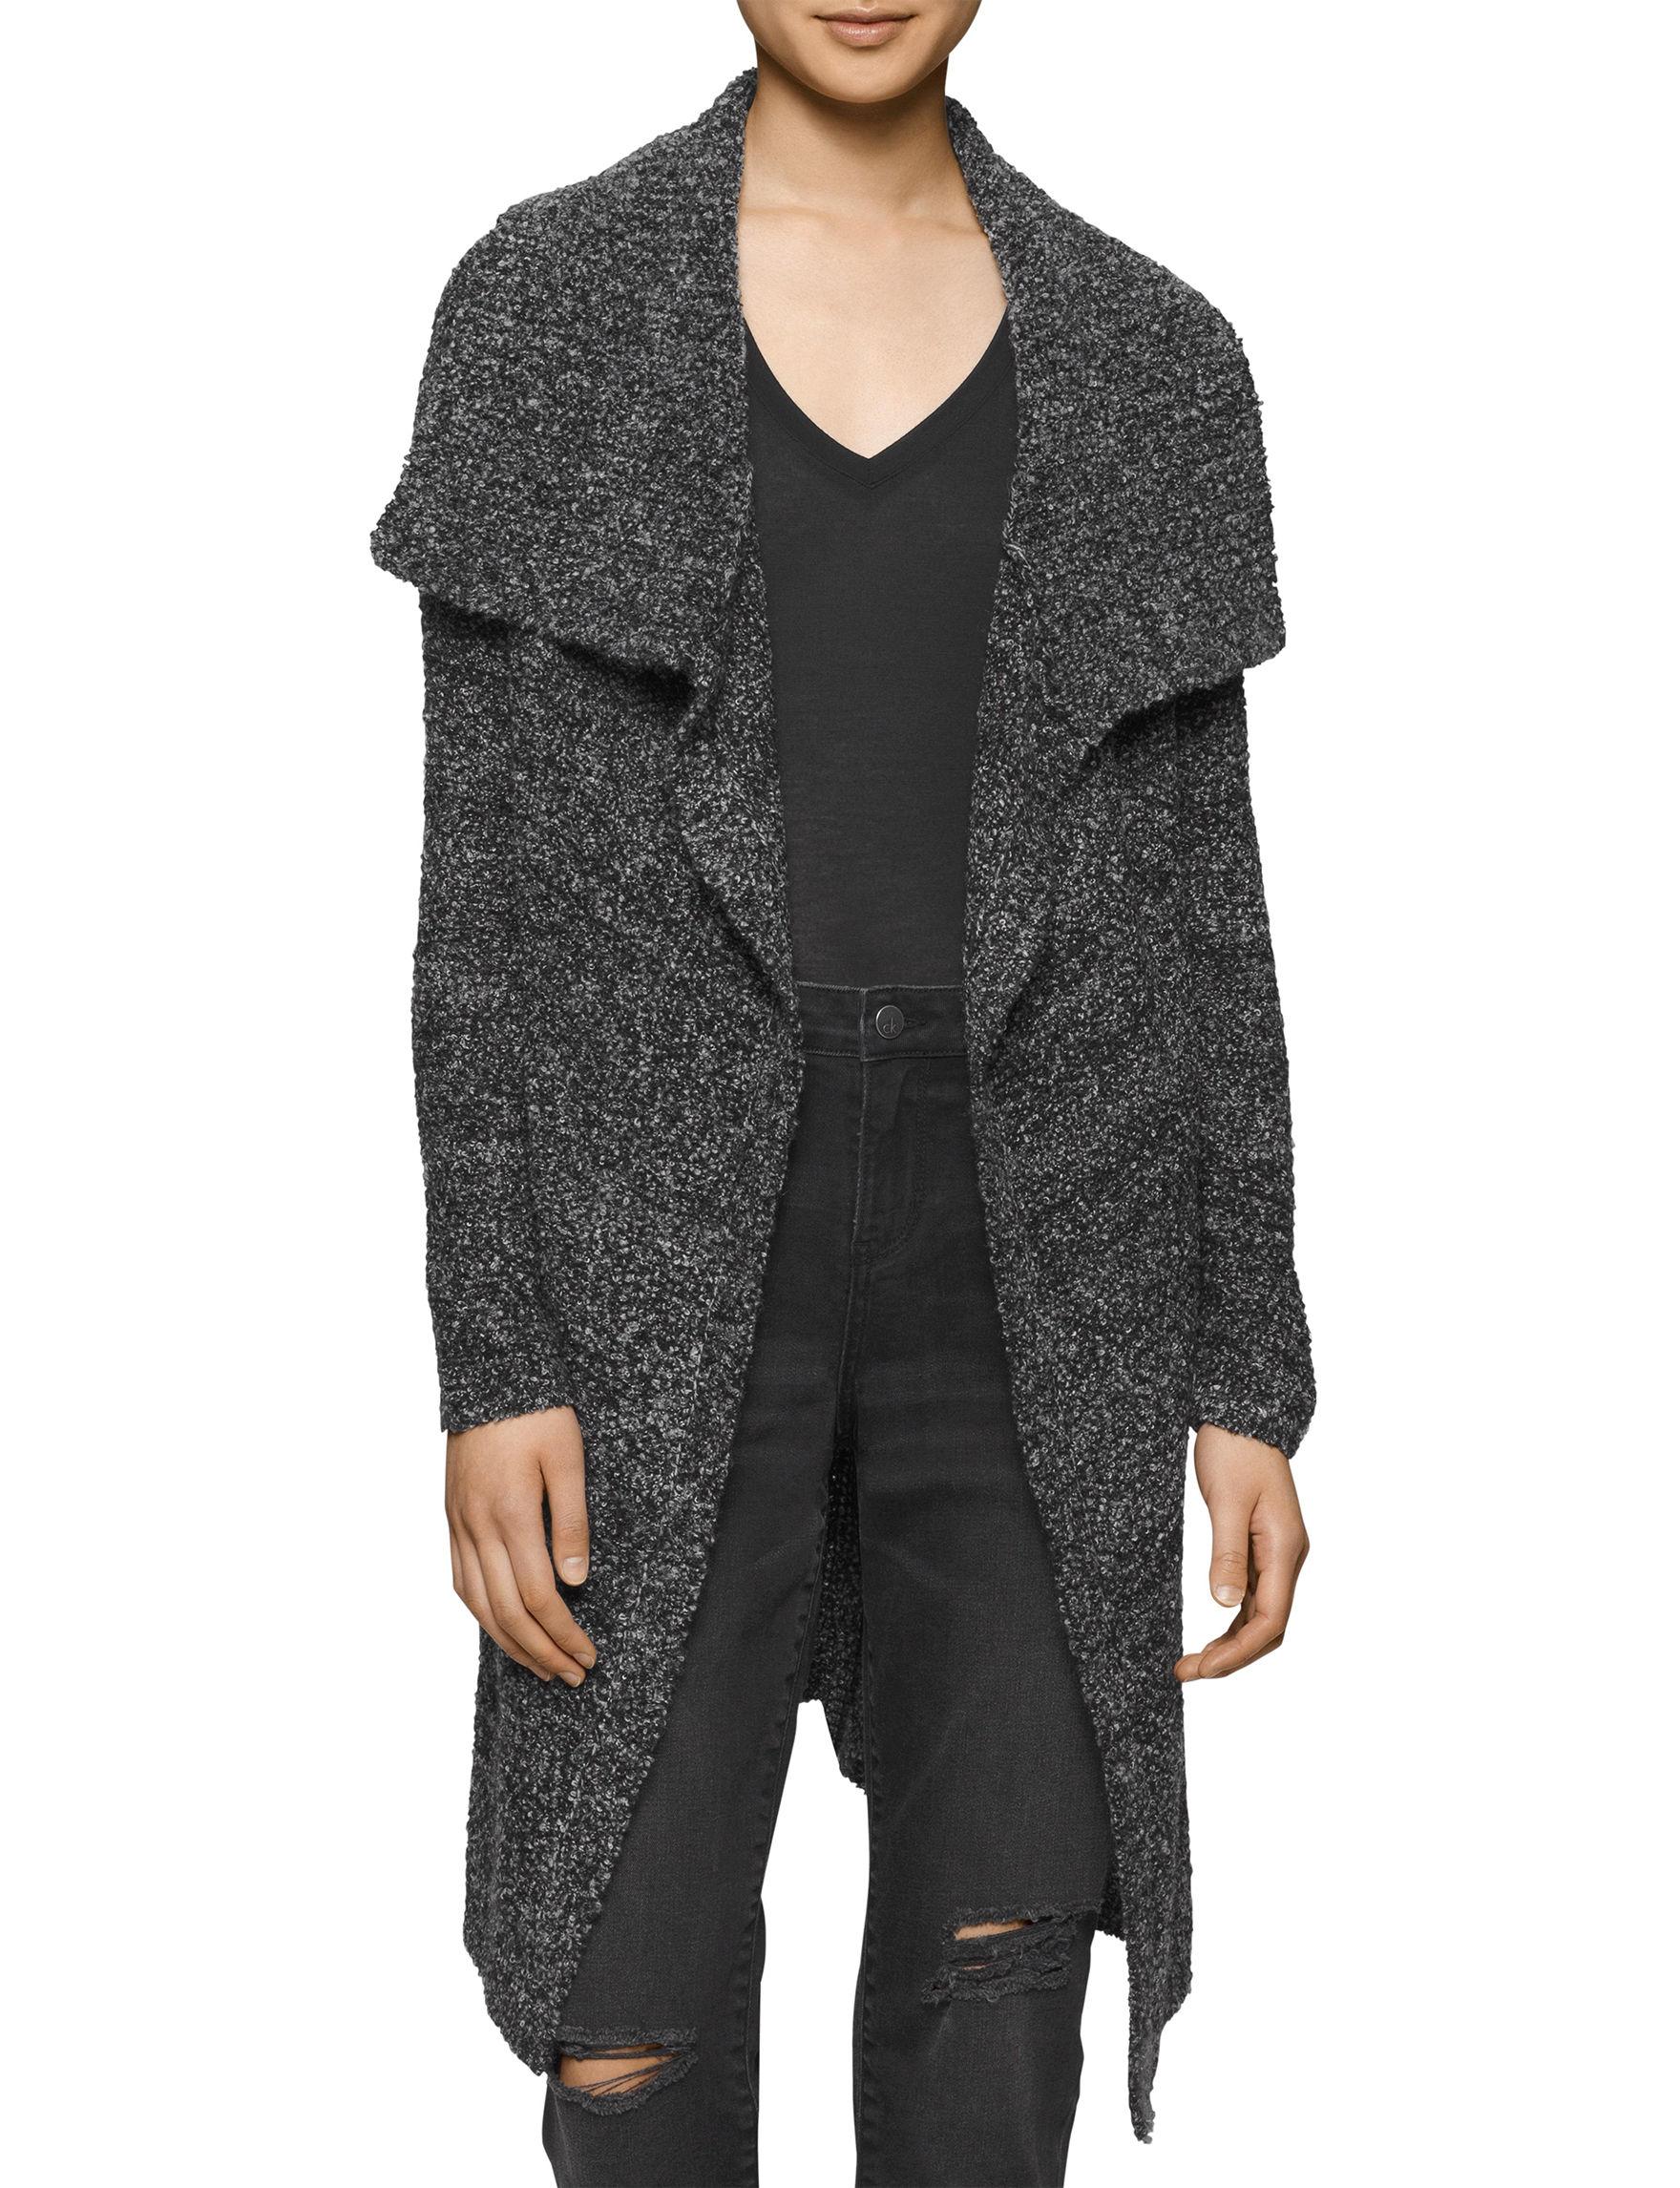 Calvin Klein Jeans Black / White Cardigans